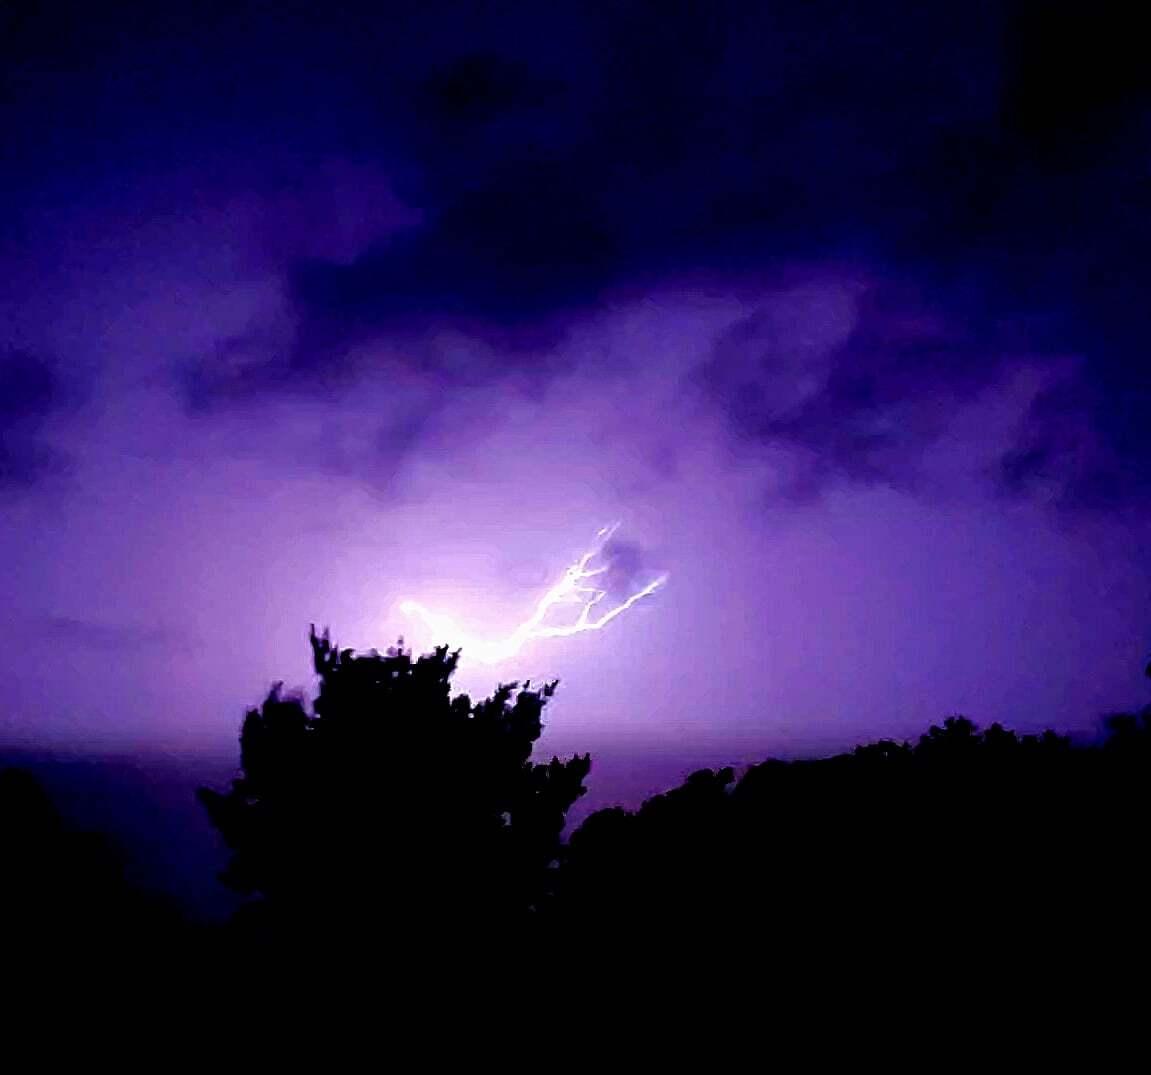 0714 HAMBURG LIGHTNING_Tina Wiepert.jpg